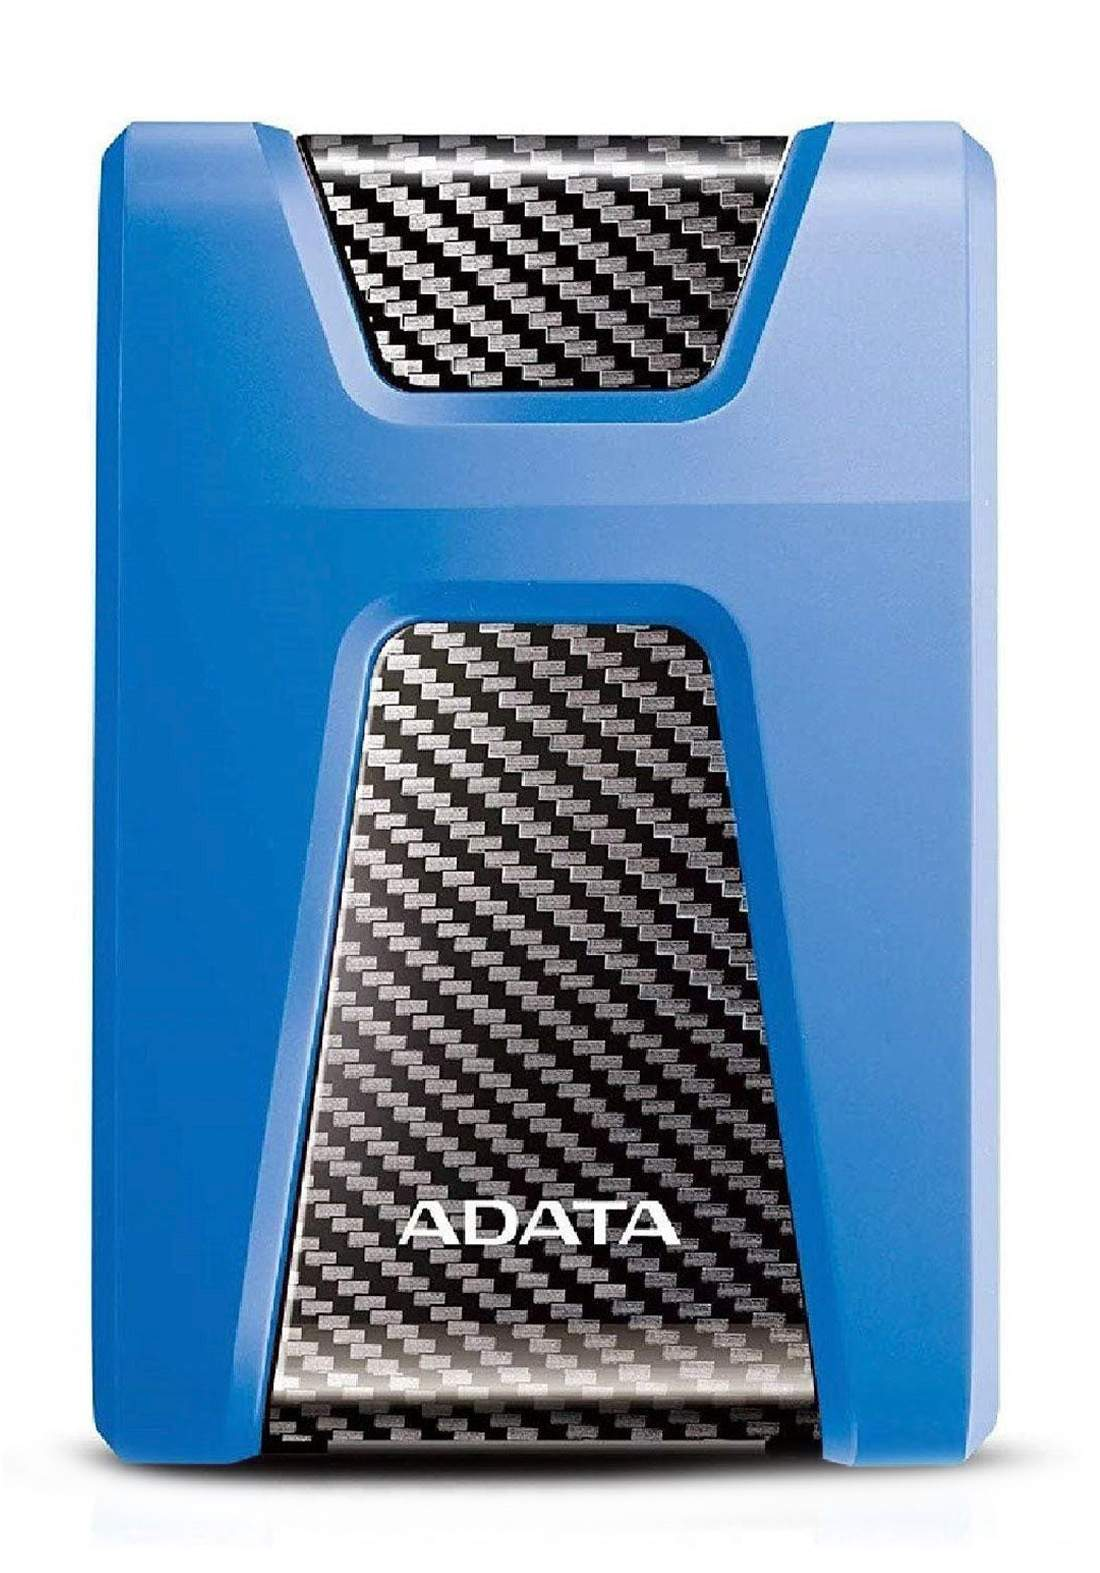 ADATA HD 650 External Hard Drive 4TB - Blue  هارد خارجي